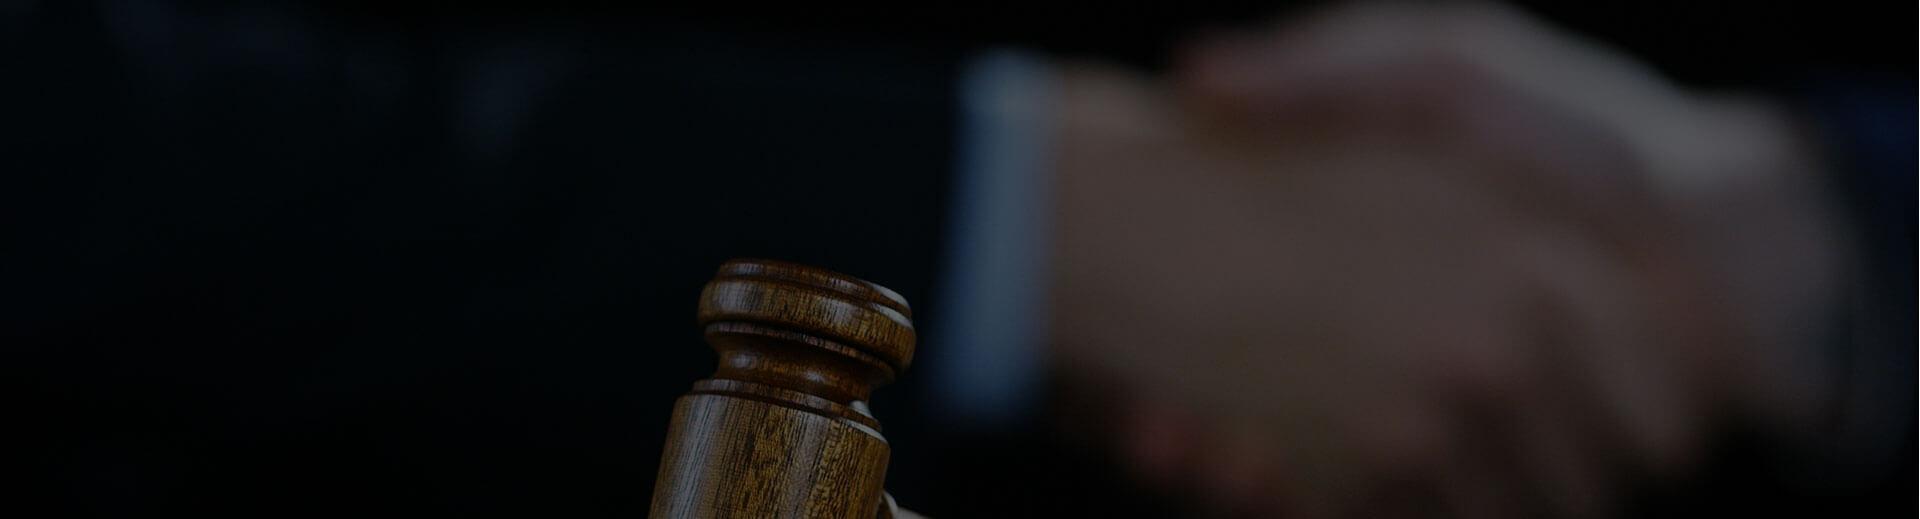 denisdejardin-avocat-page-CONTACT-banniere